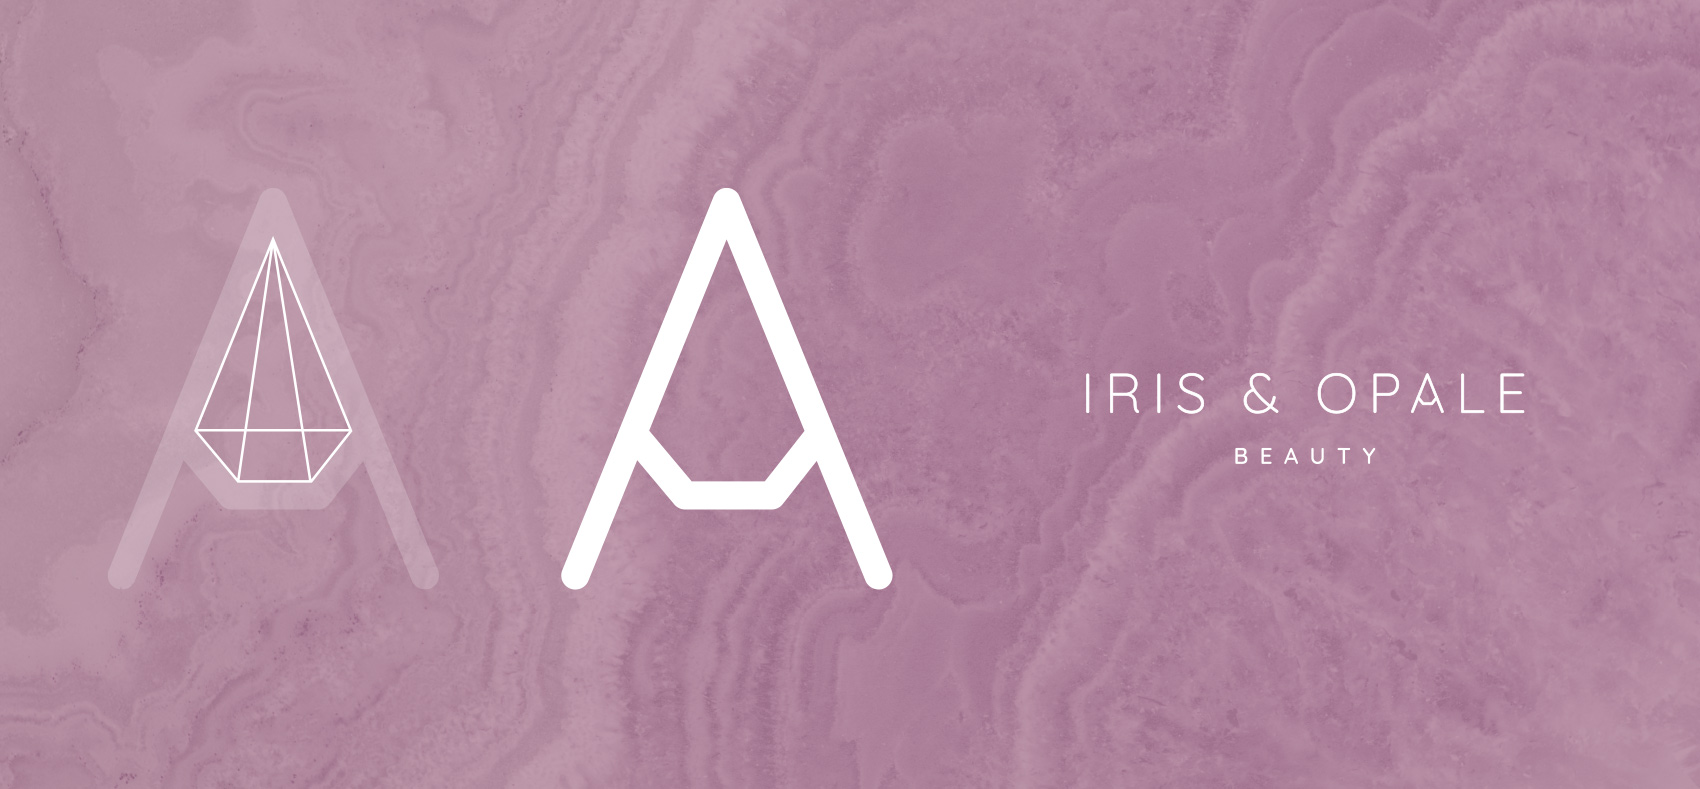 iris & opale logo construction